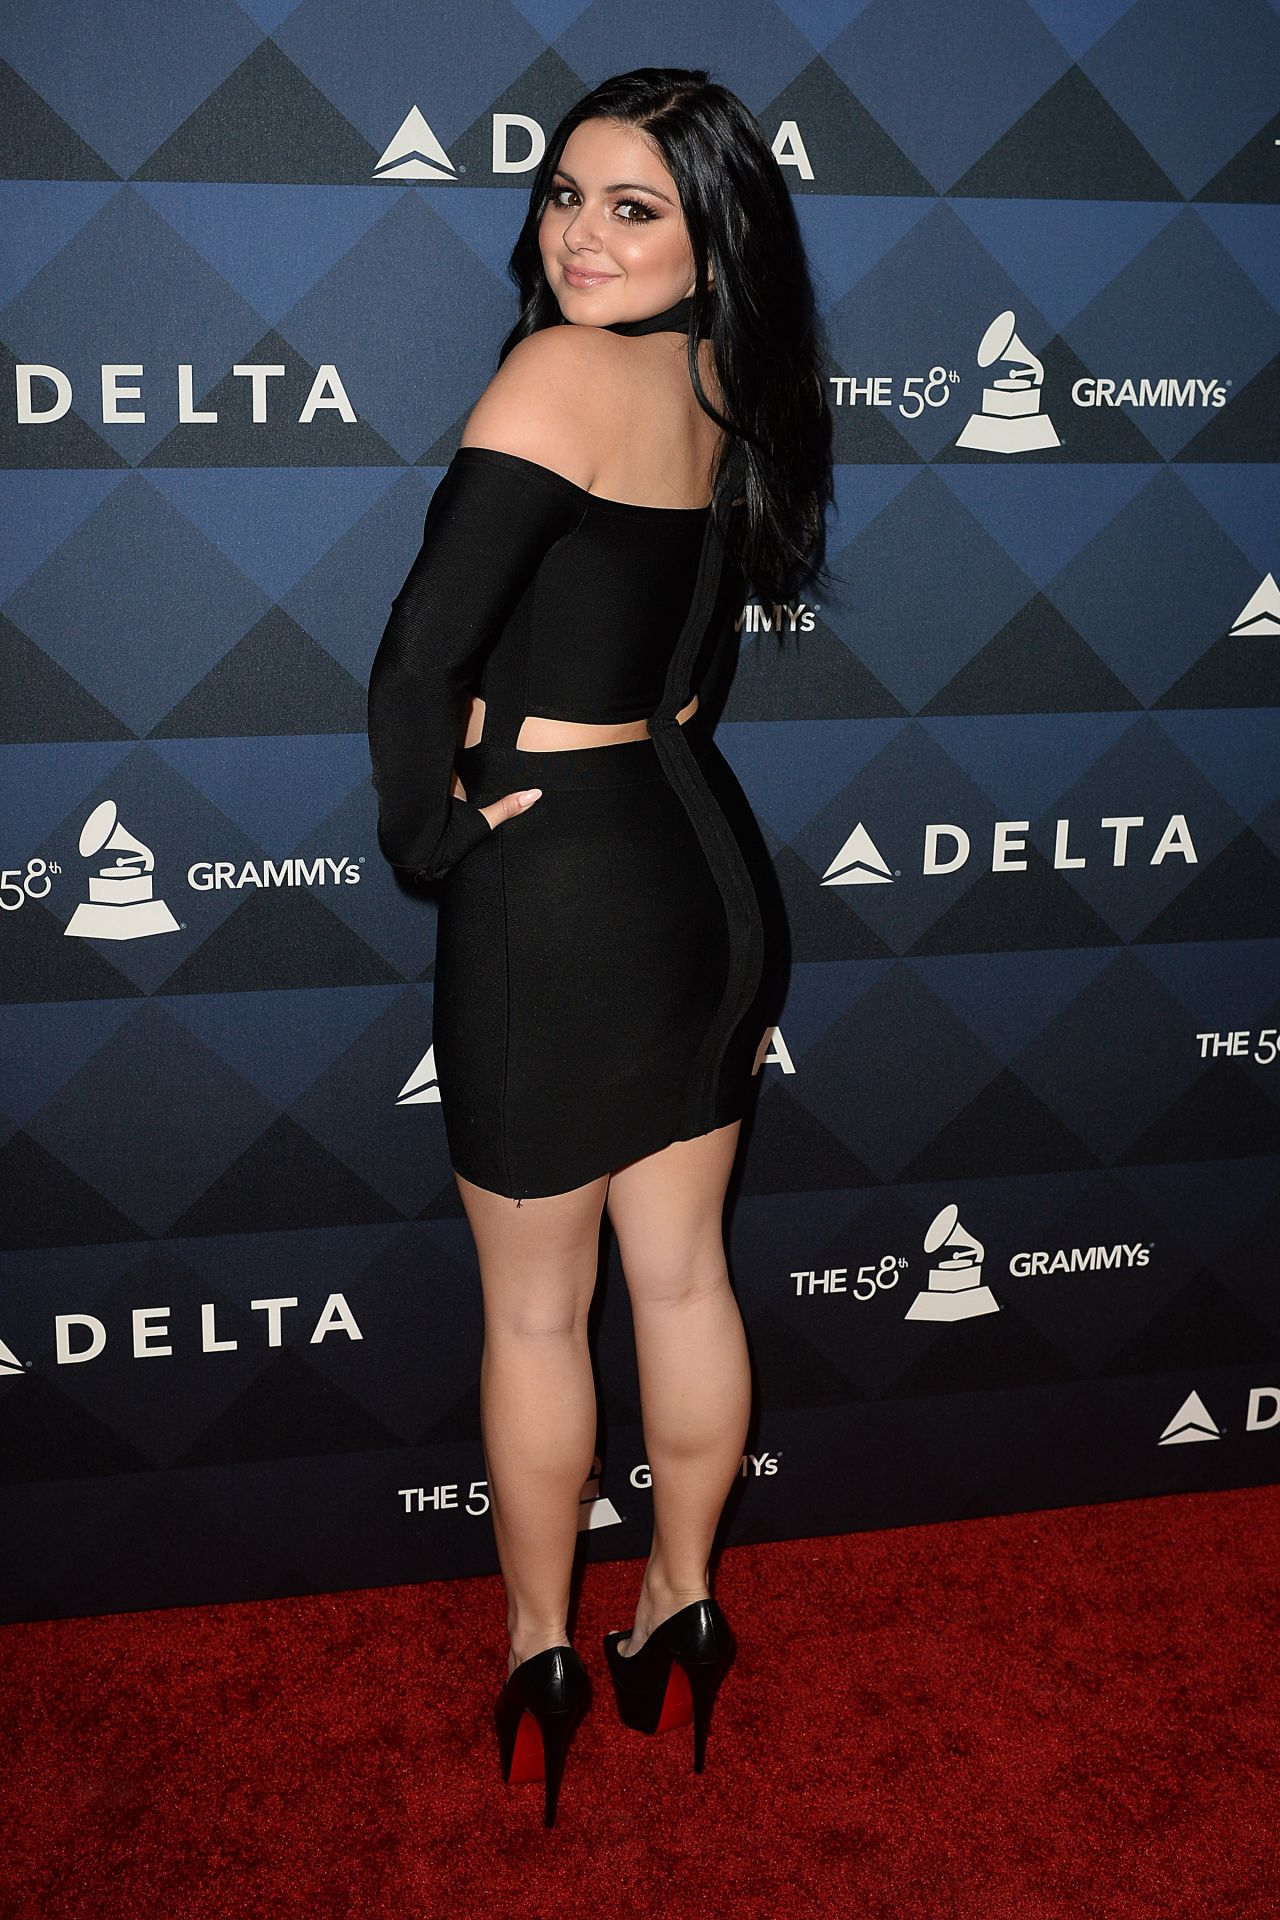 784b58177a Ariel Winter - Delta Airlines Pre-Grammy 2016 Party